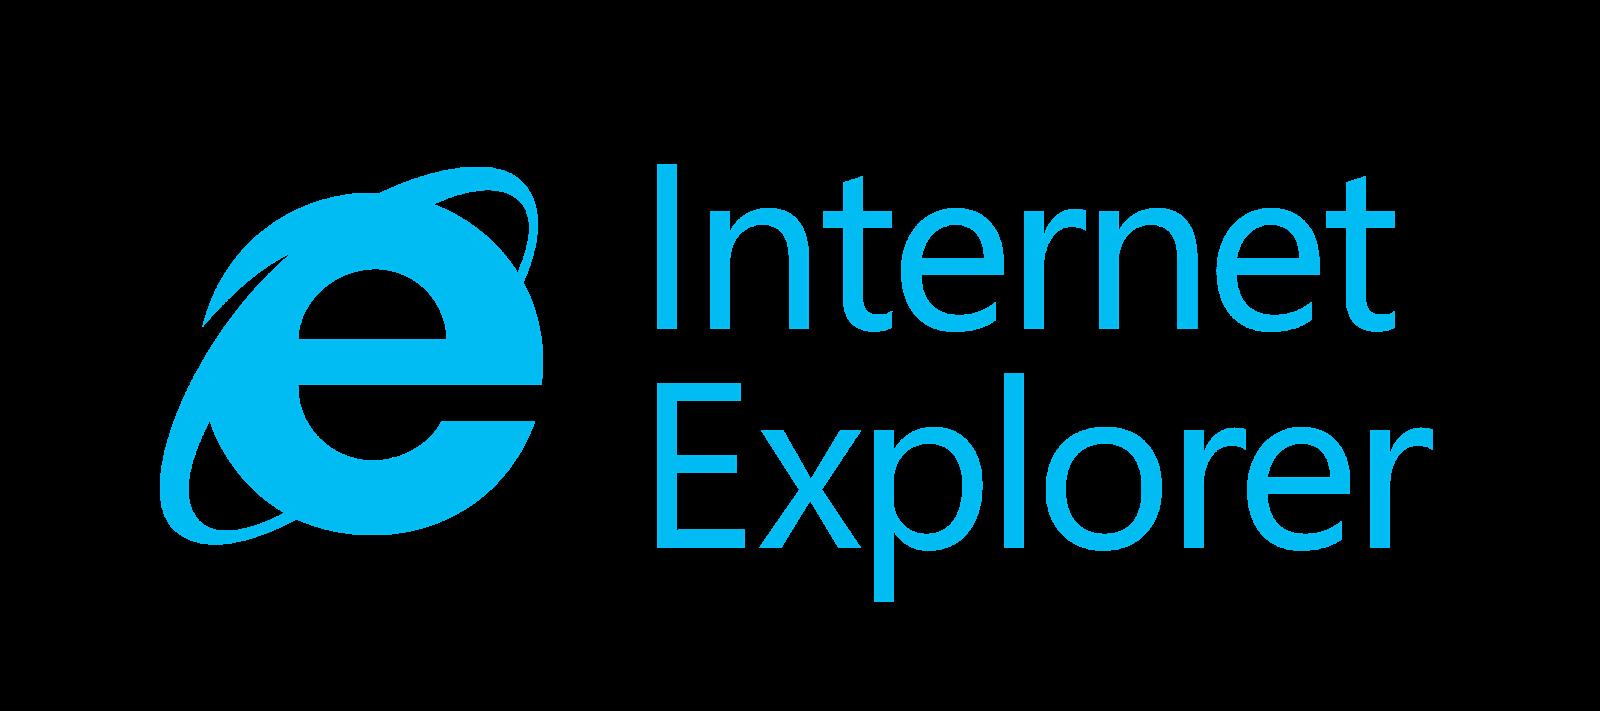 "<img src=""http://1.bp.blogspot.com/-D0T-qfNgO30/VOgWnIfSMhI/AAAAAAAAEMk/RlUqOVAgXjY/s1600/url.png"" alt=""Internet Explorer 2.1 Apk File Download"" />"